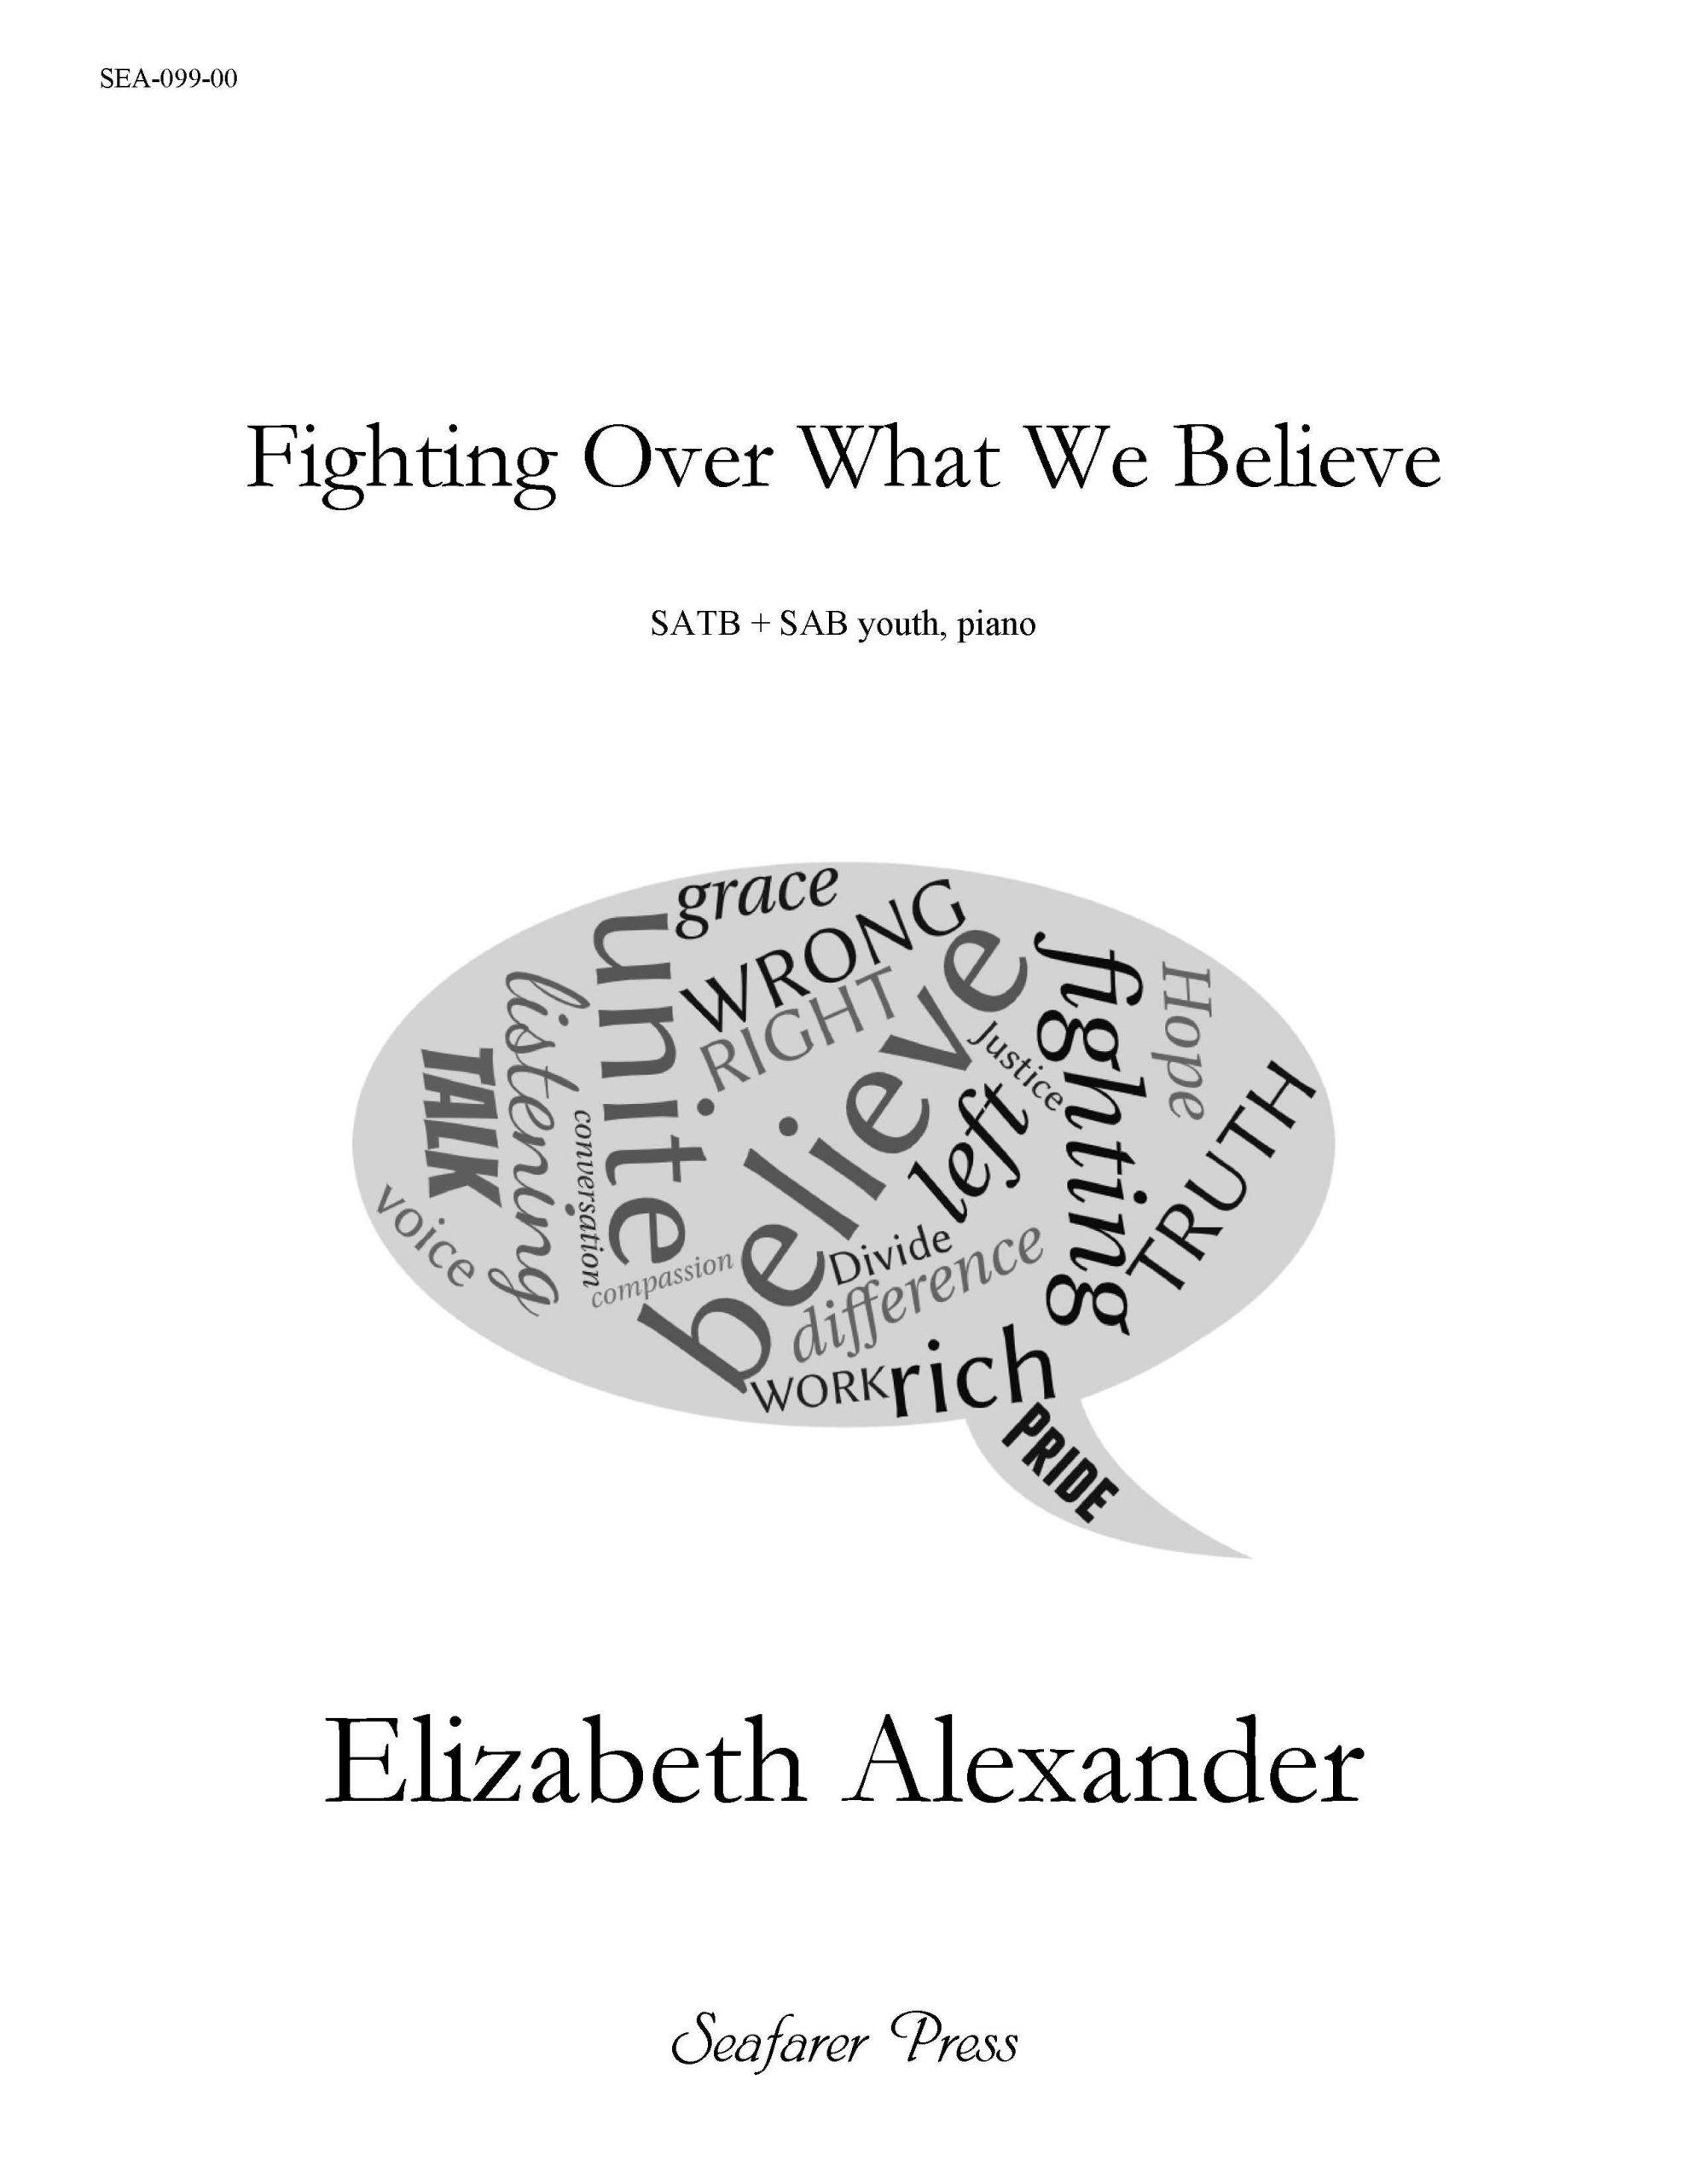 SEA-099-00 - Fighting Over What We Believe